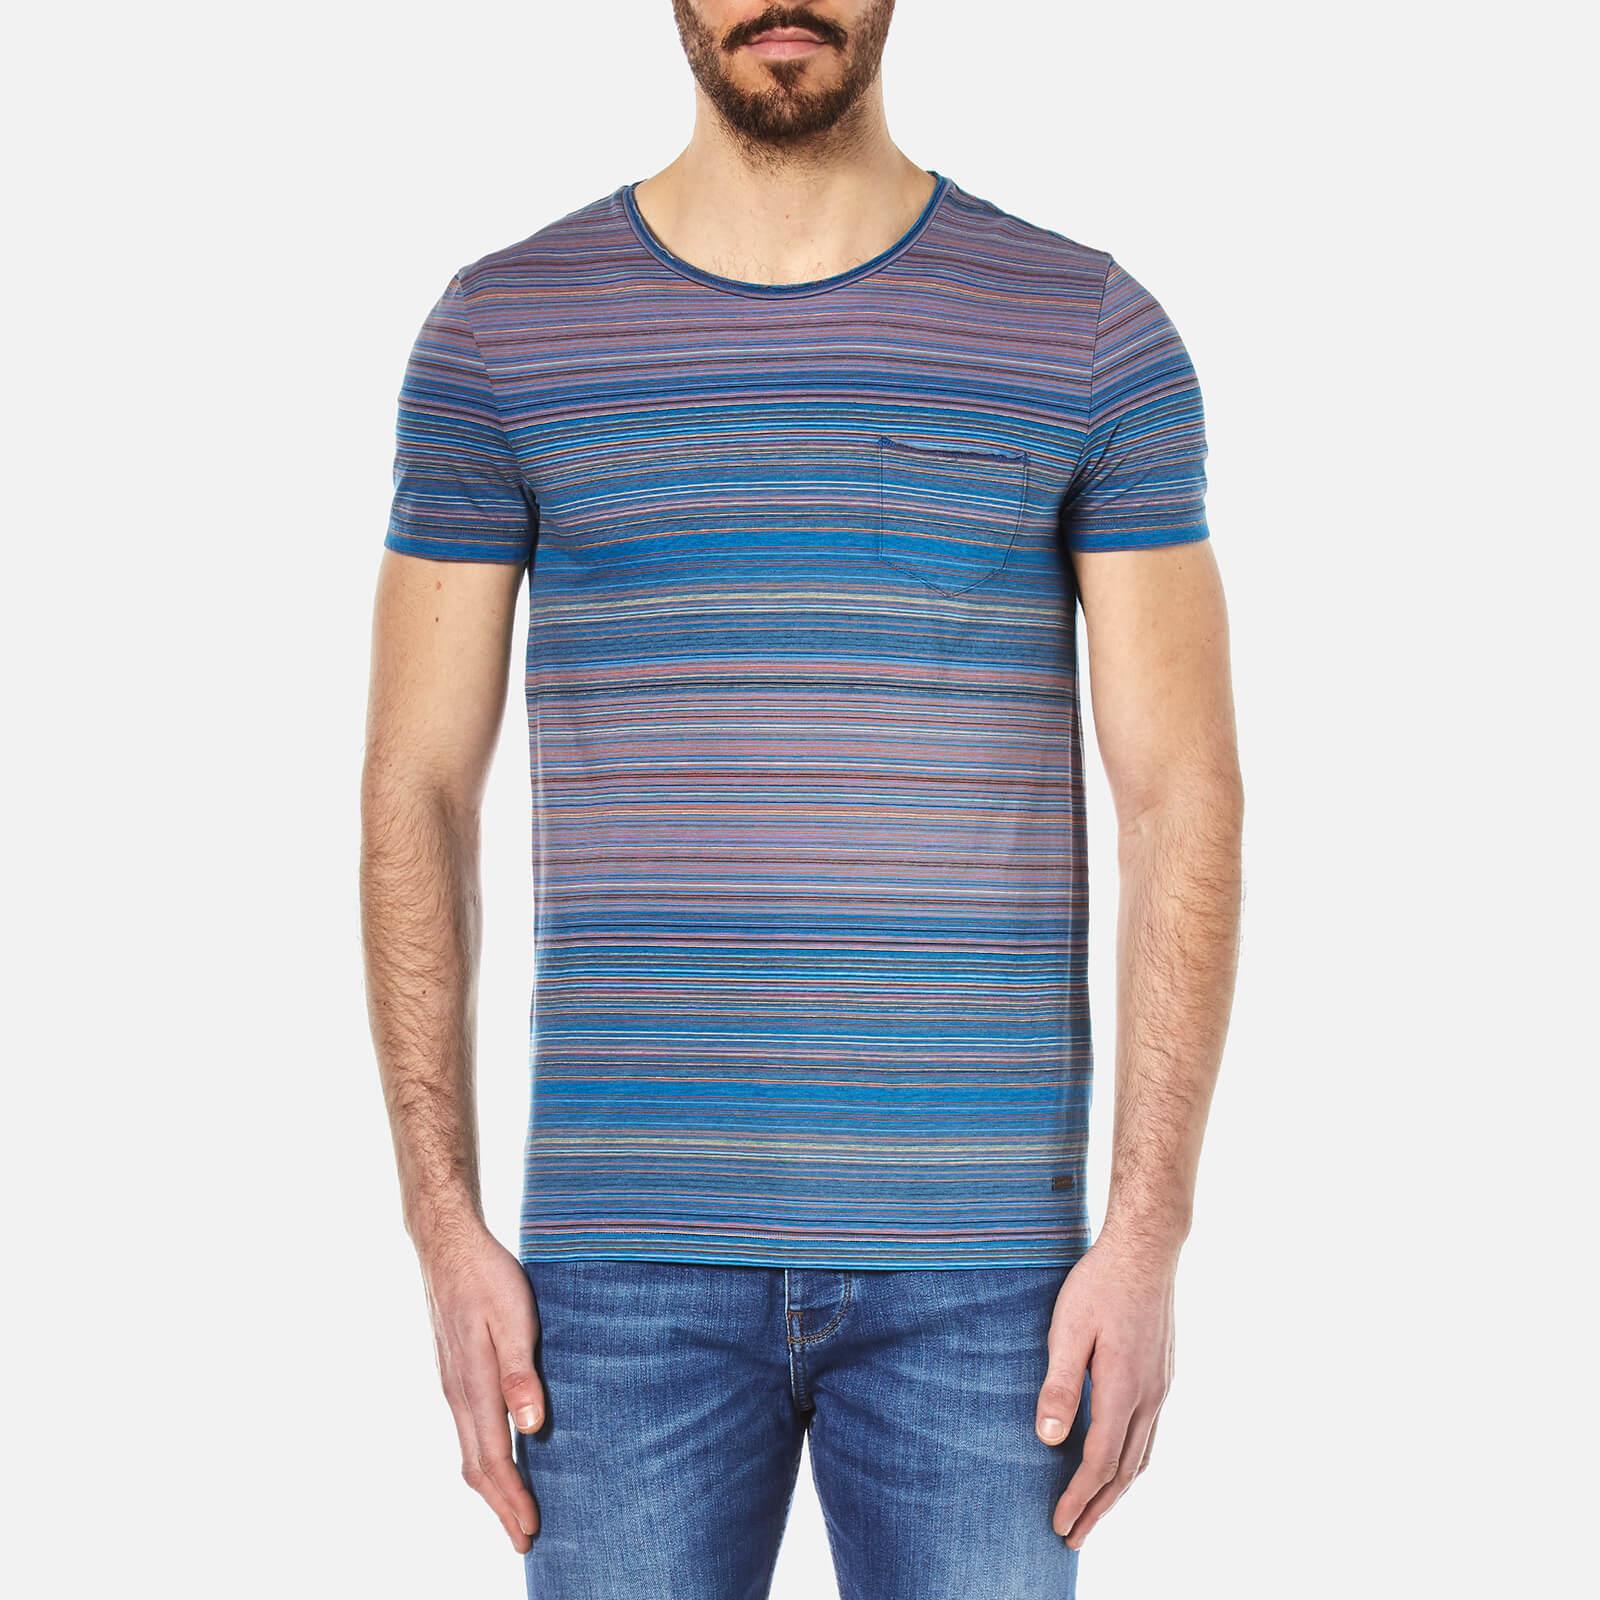 3e267d214 BOSS Orange Men's Tedryk Striped T-Shirt - Open Blue - Free UK Delivery  over £50